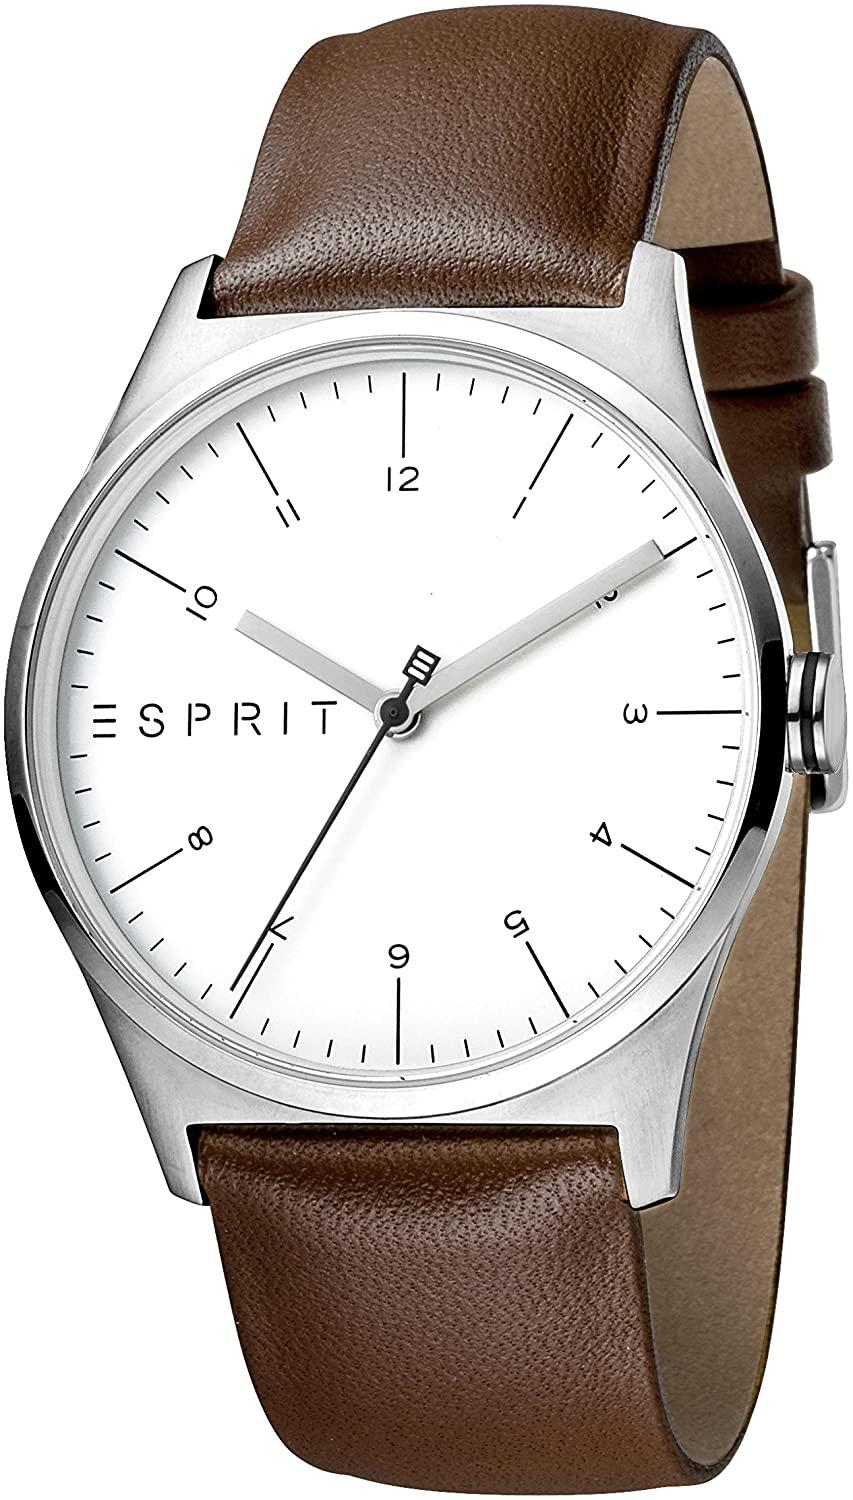 Esprit ES1G034L0015 Uhr Herren 40mm 3ATM